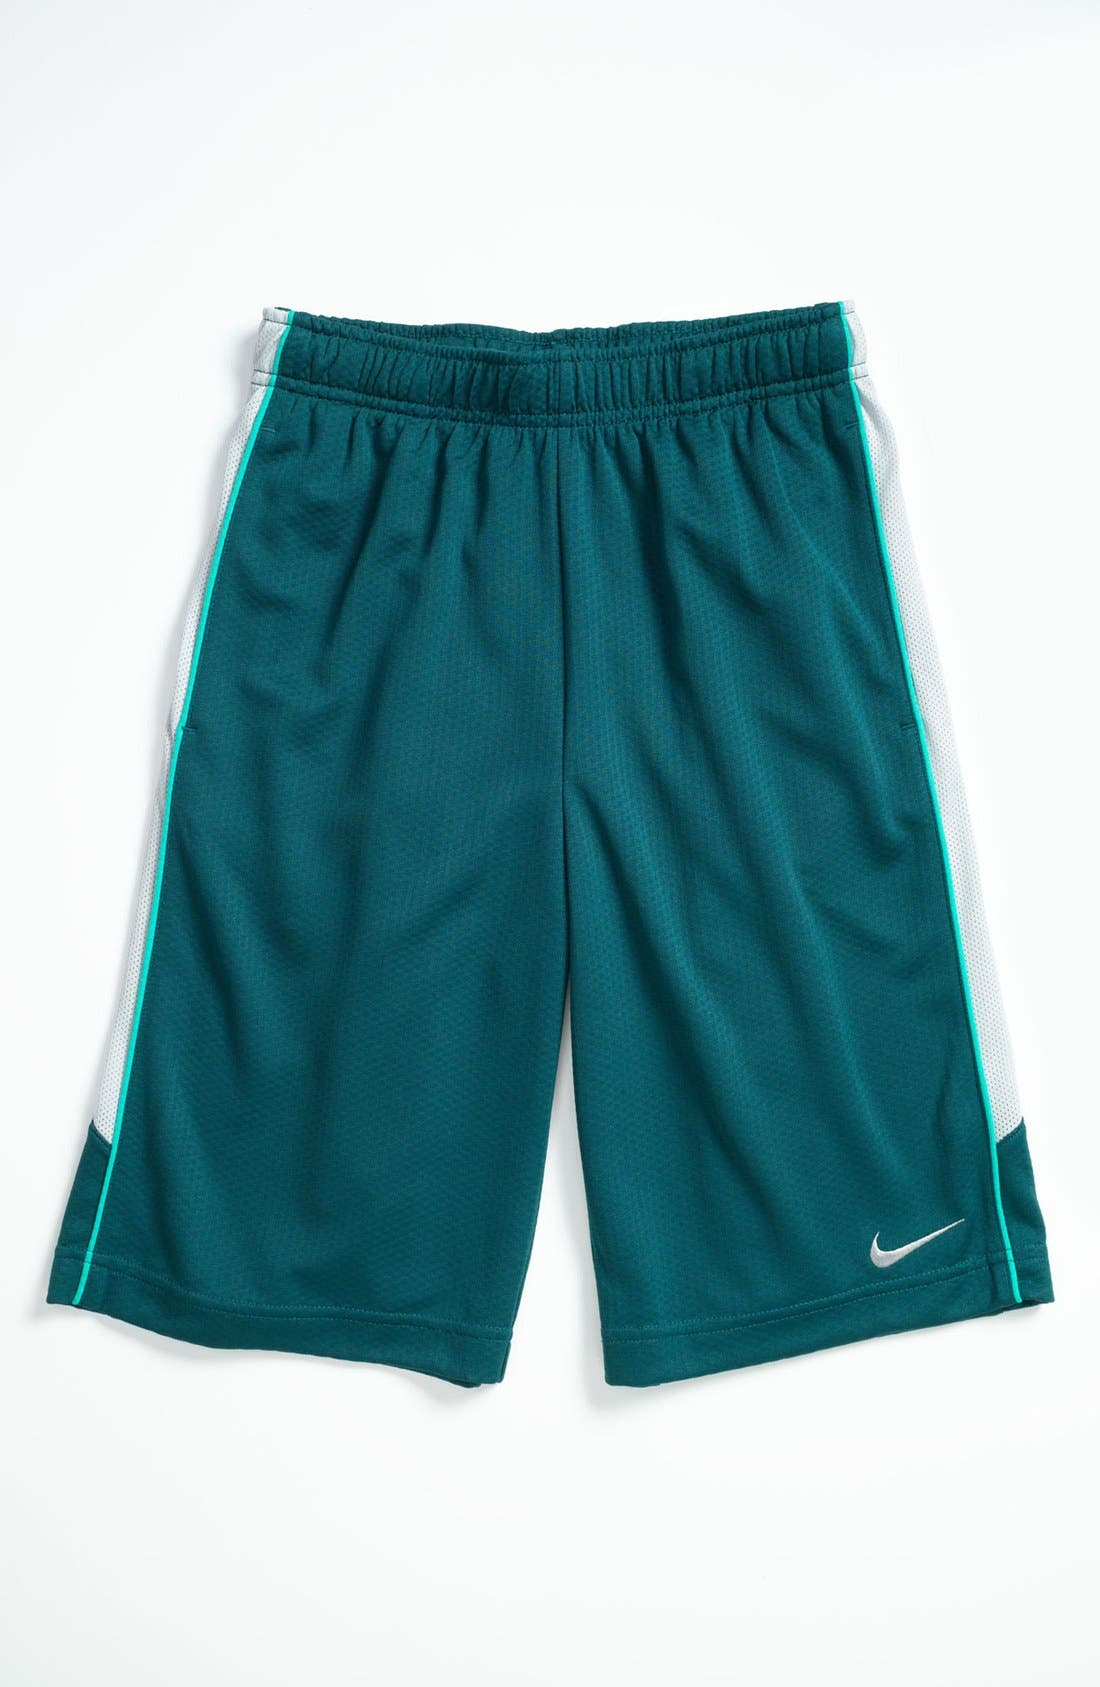 Alternate Image 1 Selected - Nike 'Aceler8' Shorts (Big Boys)